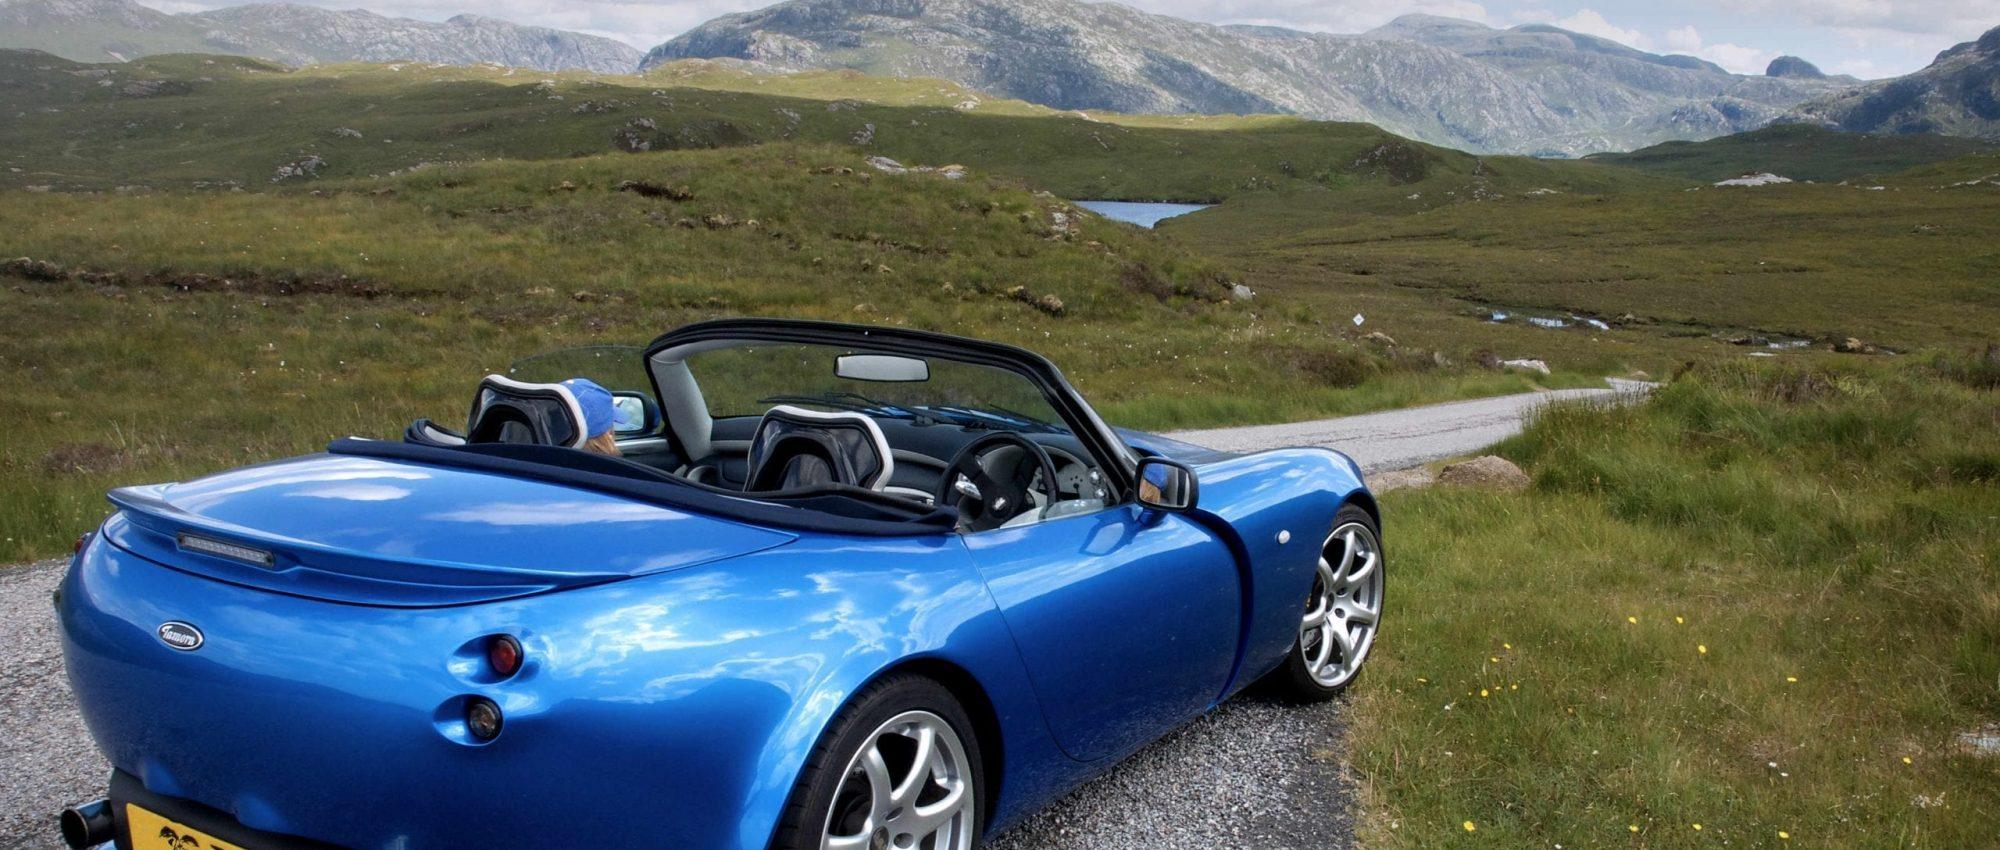 NC500-Road-Trip-Scotland